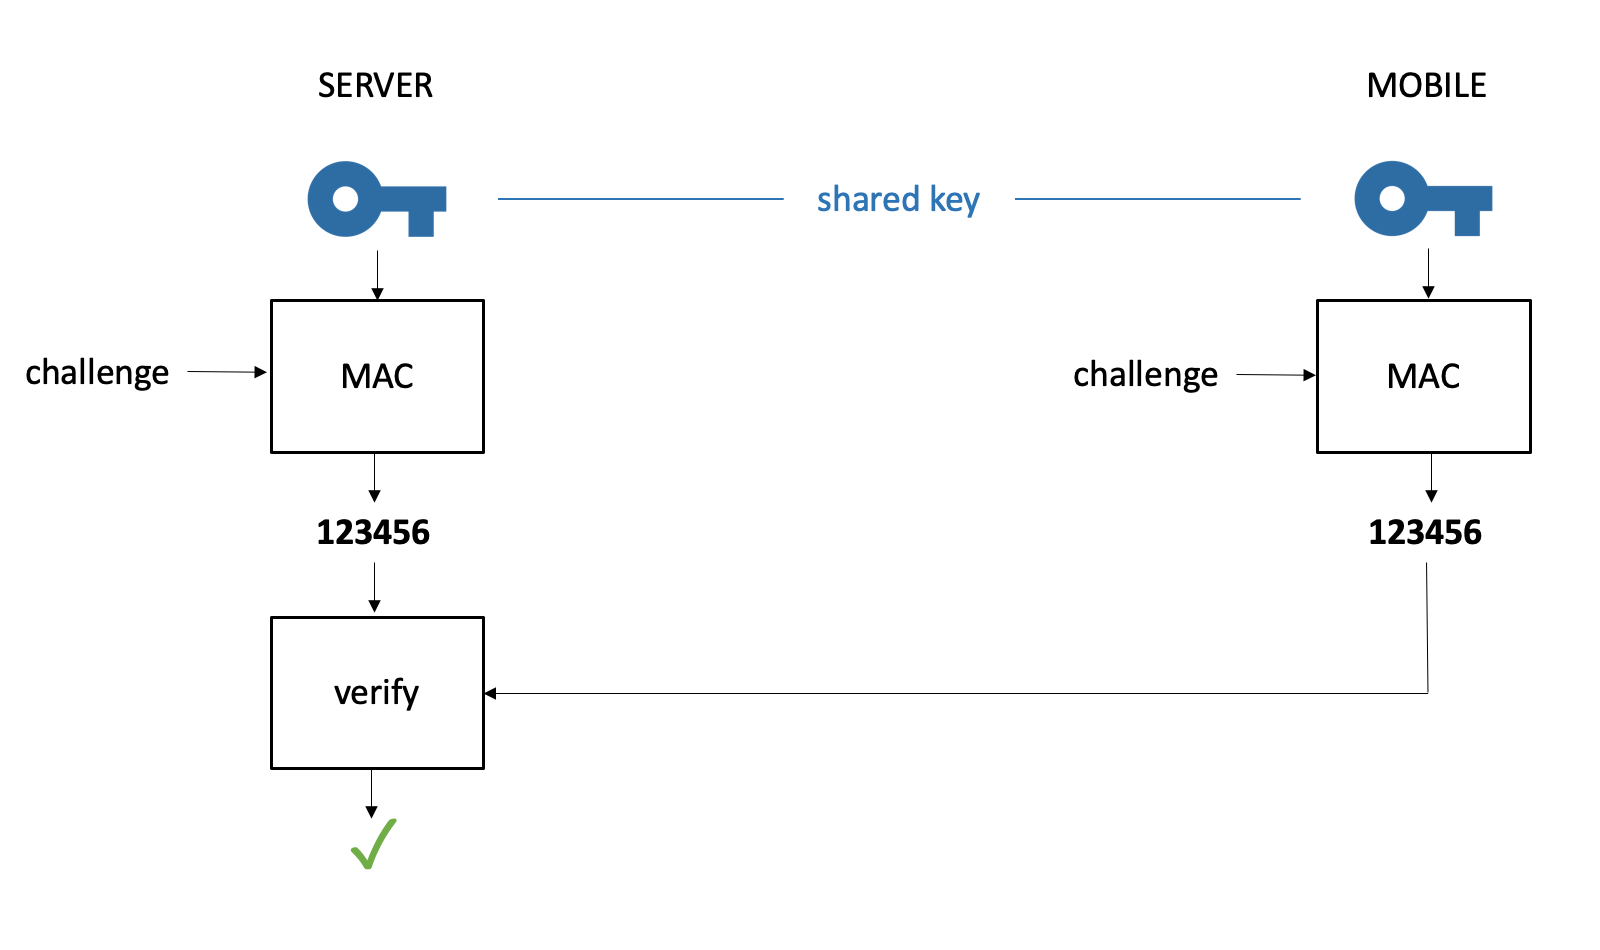 OTP generation and verification